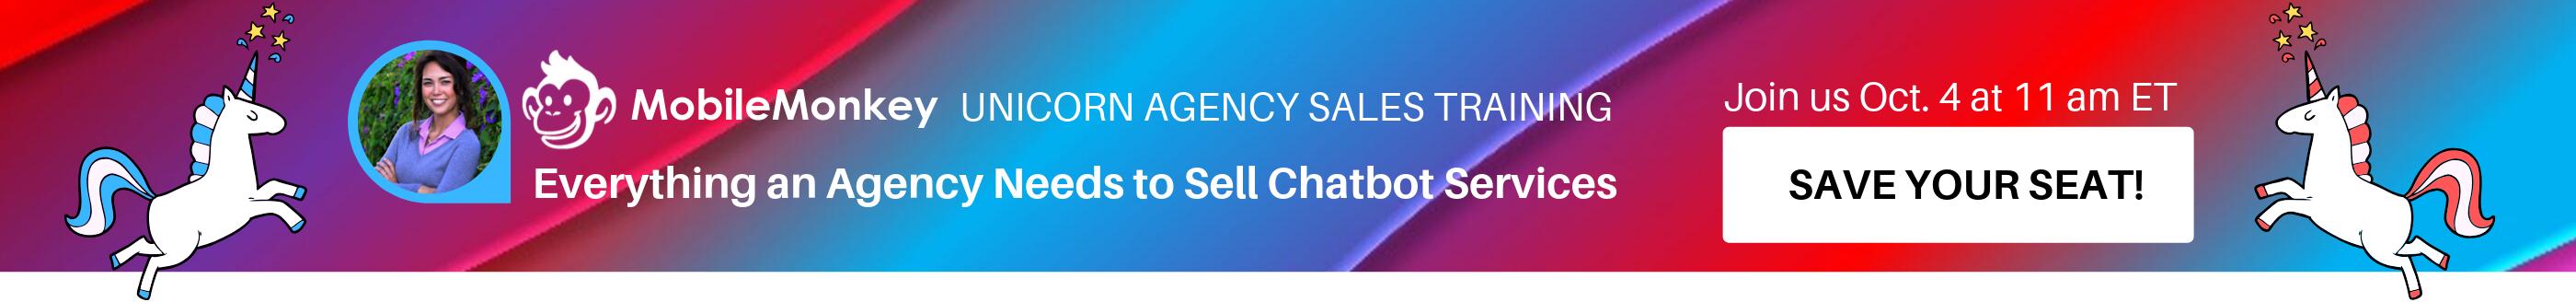 WSI Unicorn Agency Chatbot Sales Webinar Banner